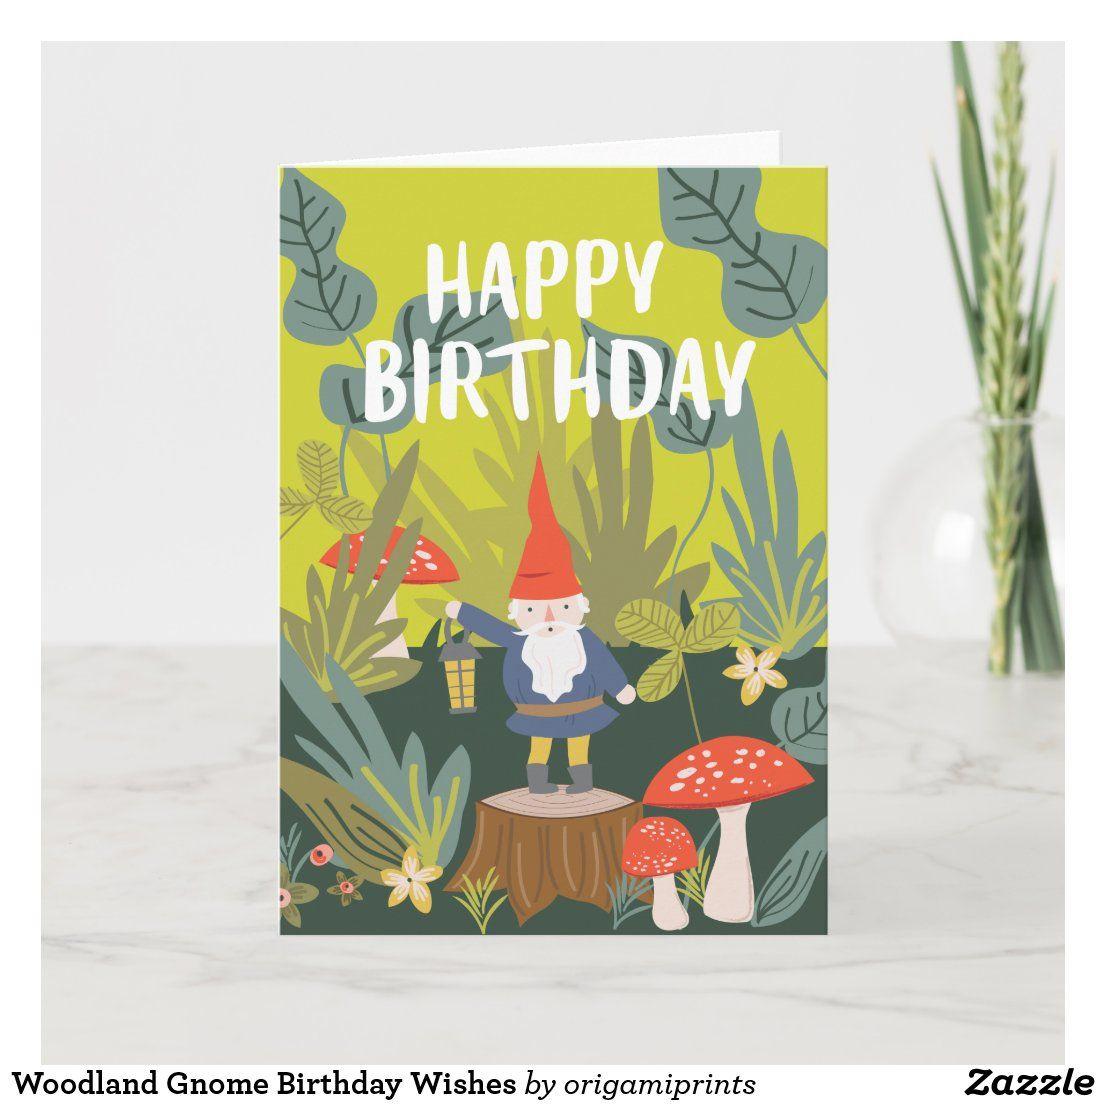 Woodland Gnome Birthday Wishes Card Zazzle Com In 2021 Birthday Wishes Cards Birthday Wishes Birthday Wishes Greeting Cards